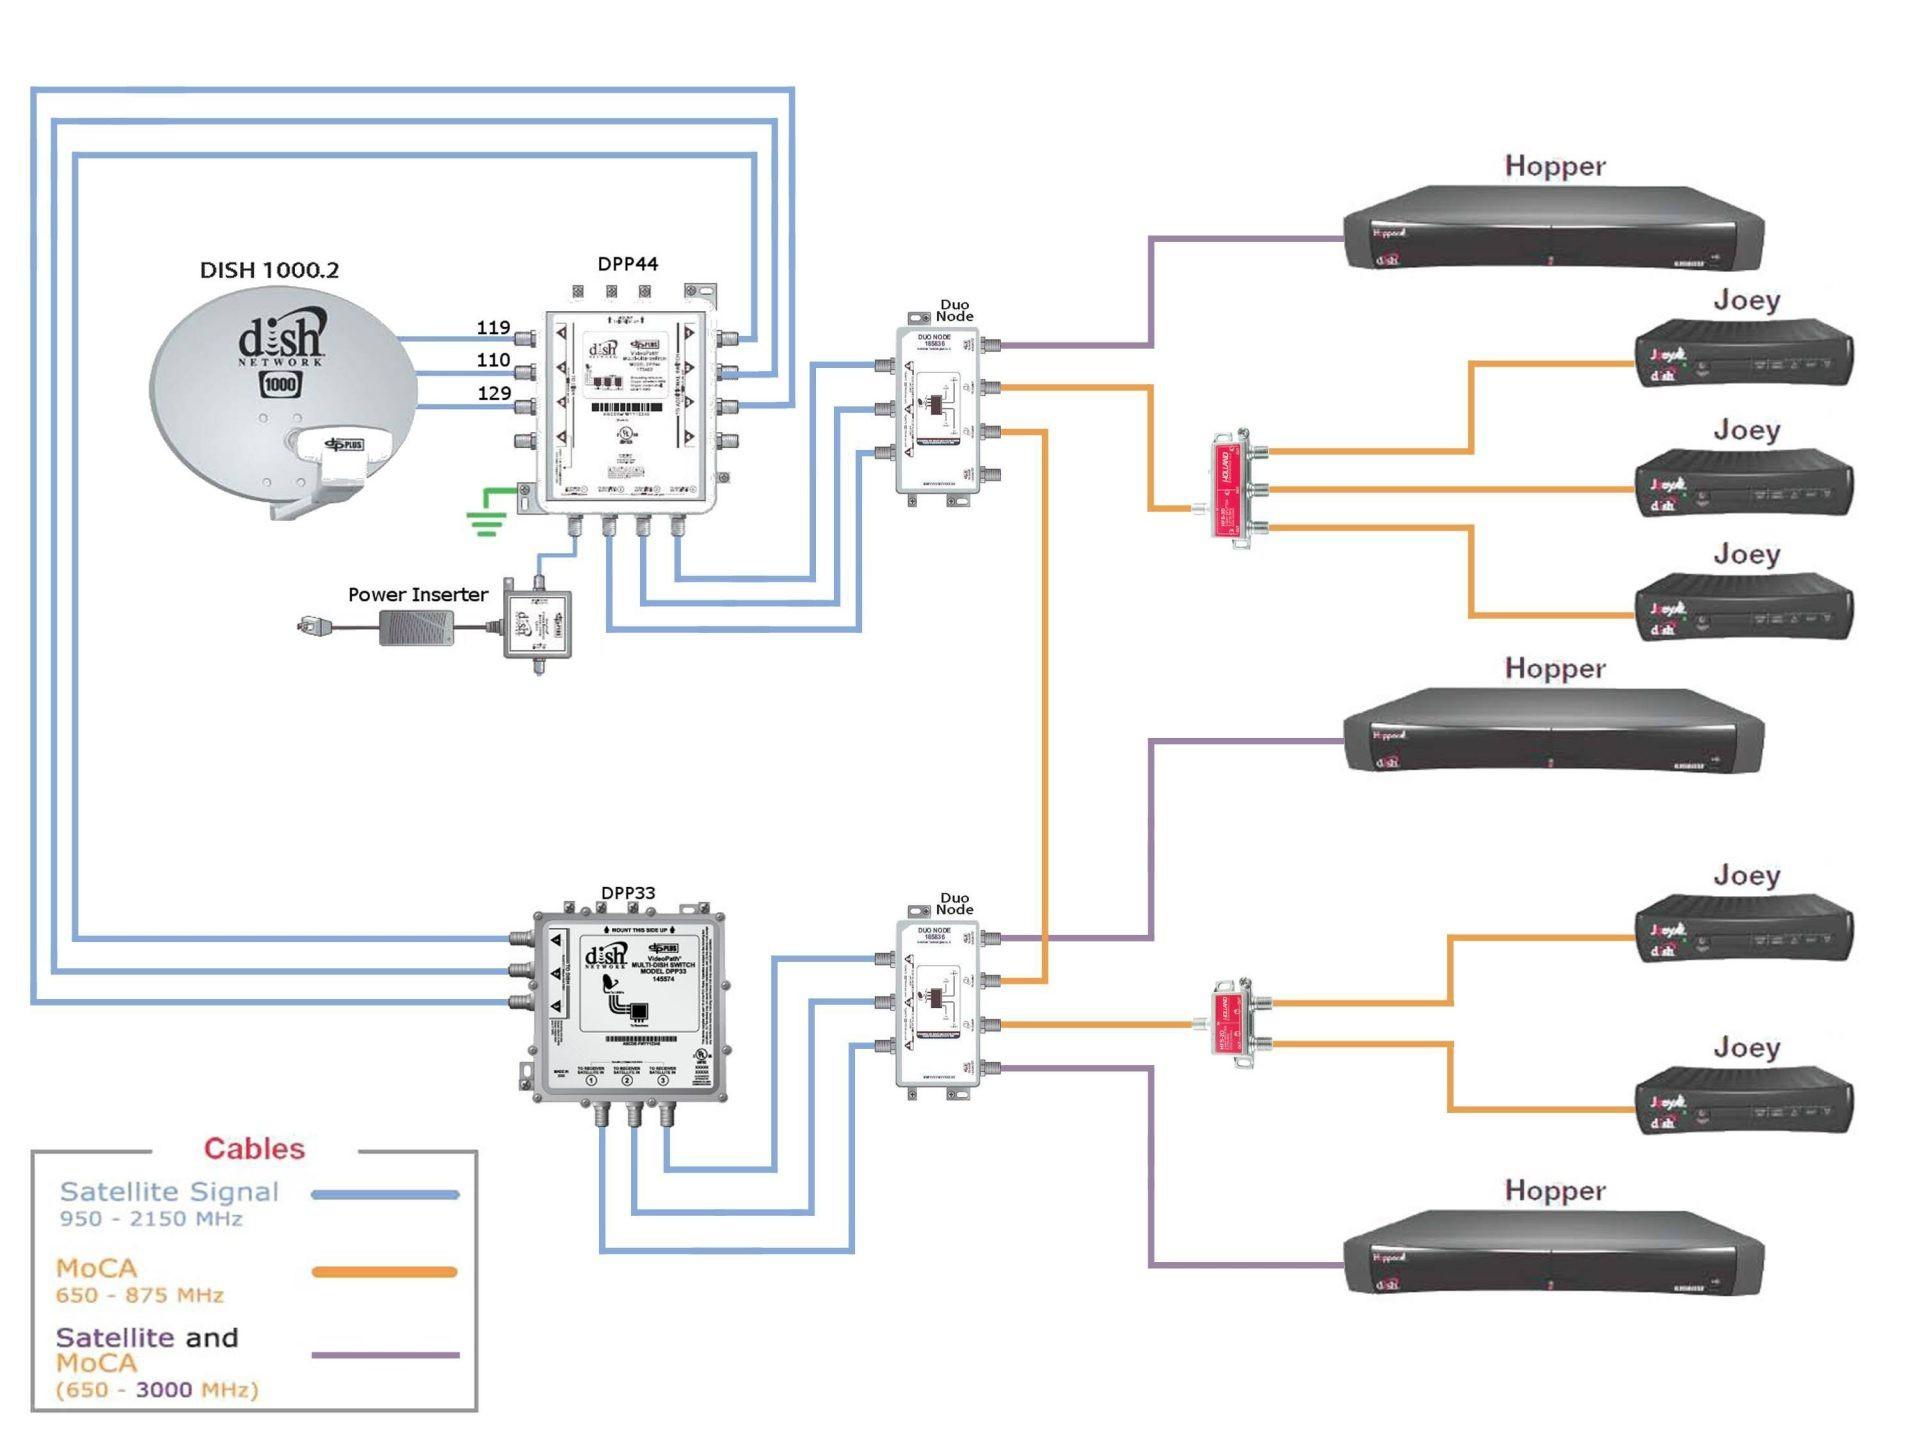 Directv Swm Splitter Wiring Diagram Elegant Rv Cable and Satellite Wiring Diagram Diagram Of Directv Swm Splitter Wiring Diagram